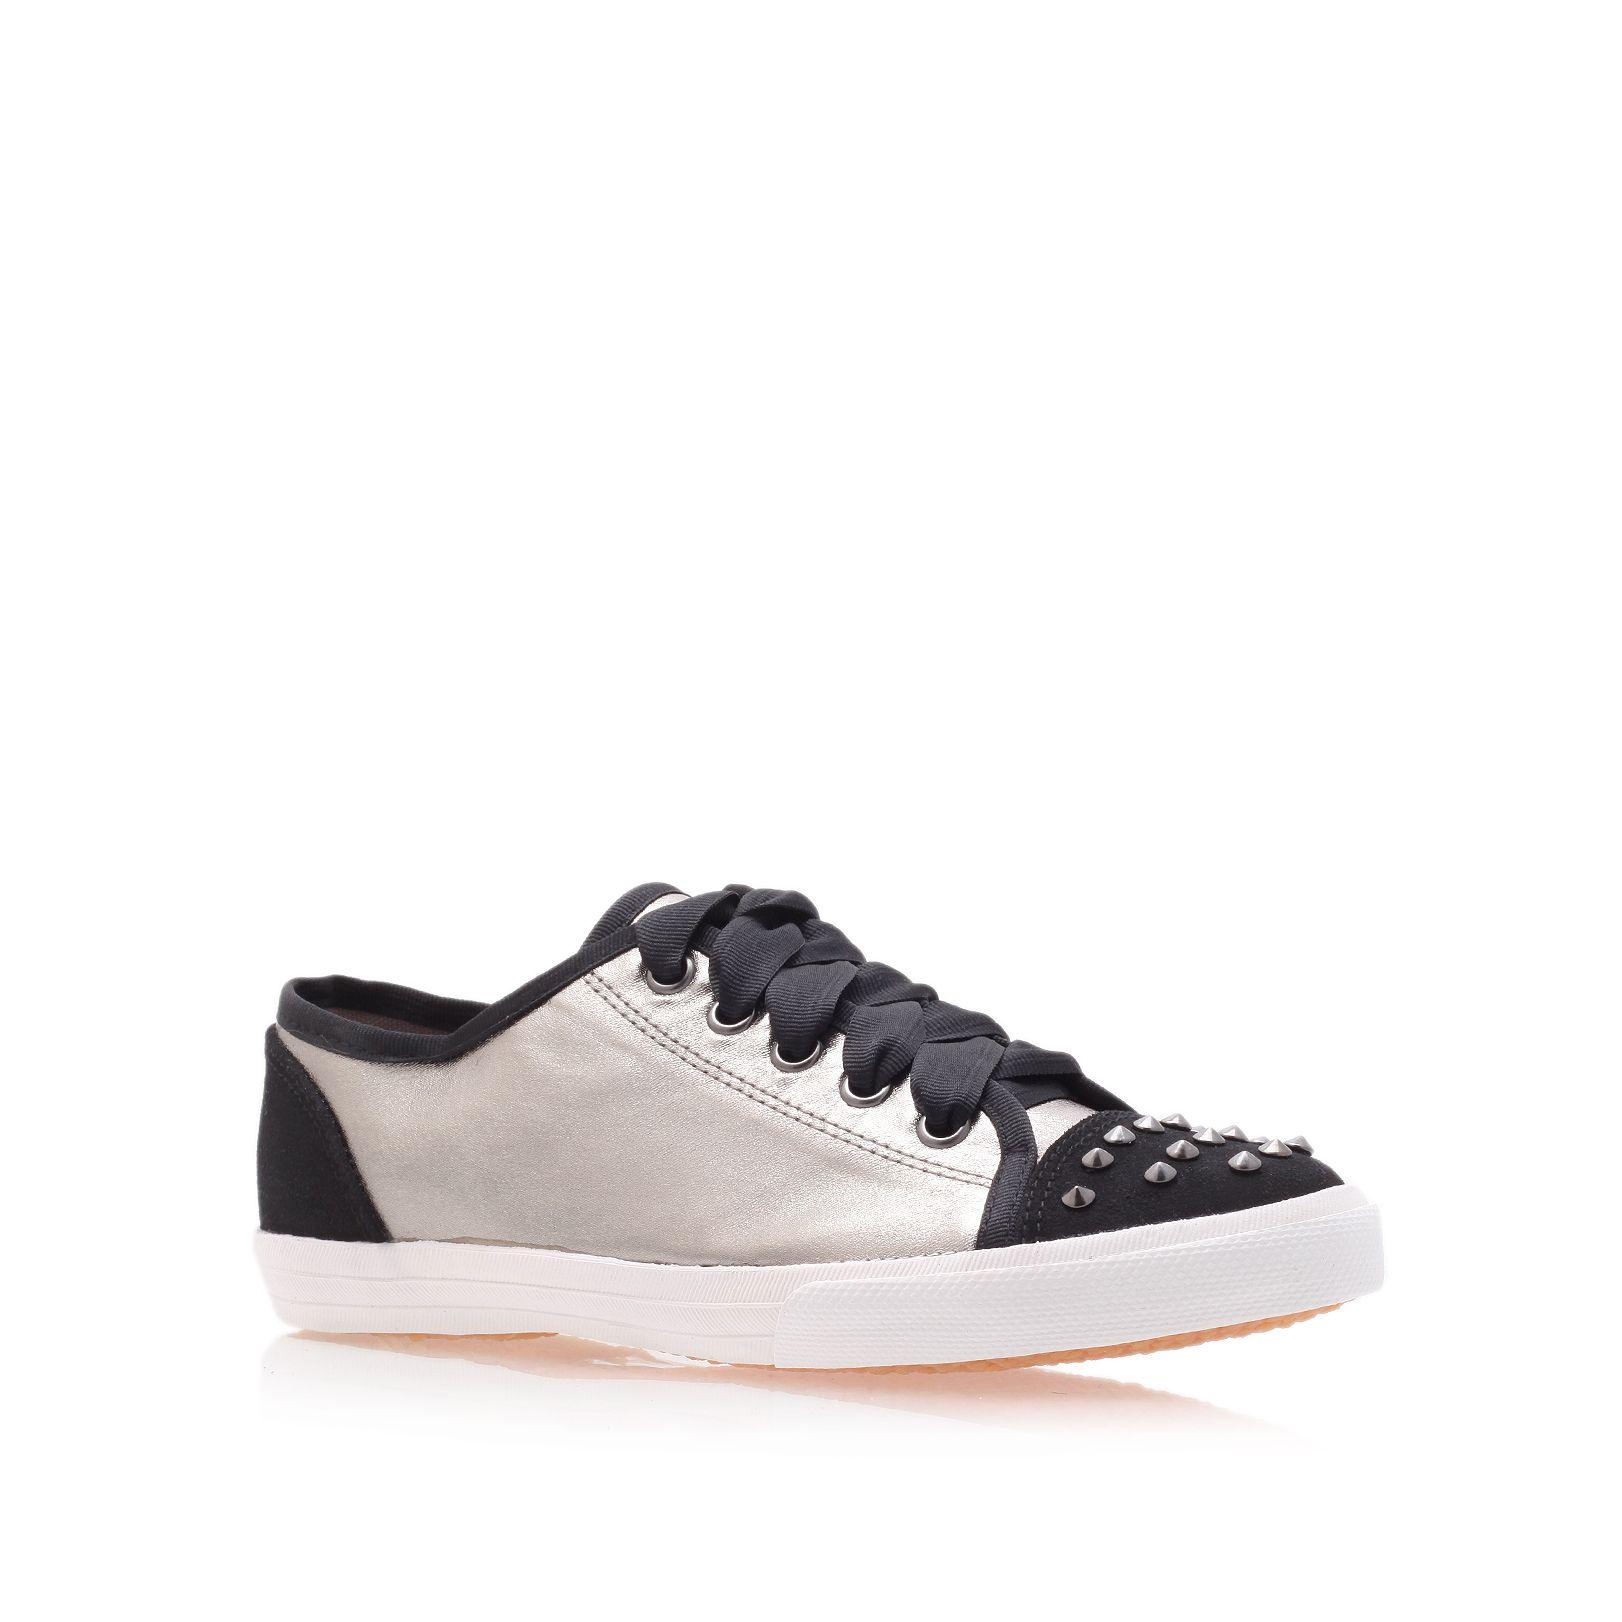 Carvela Kurt Geiger Jenson Trainer Shoes In Gray For Men   Lyst